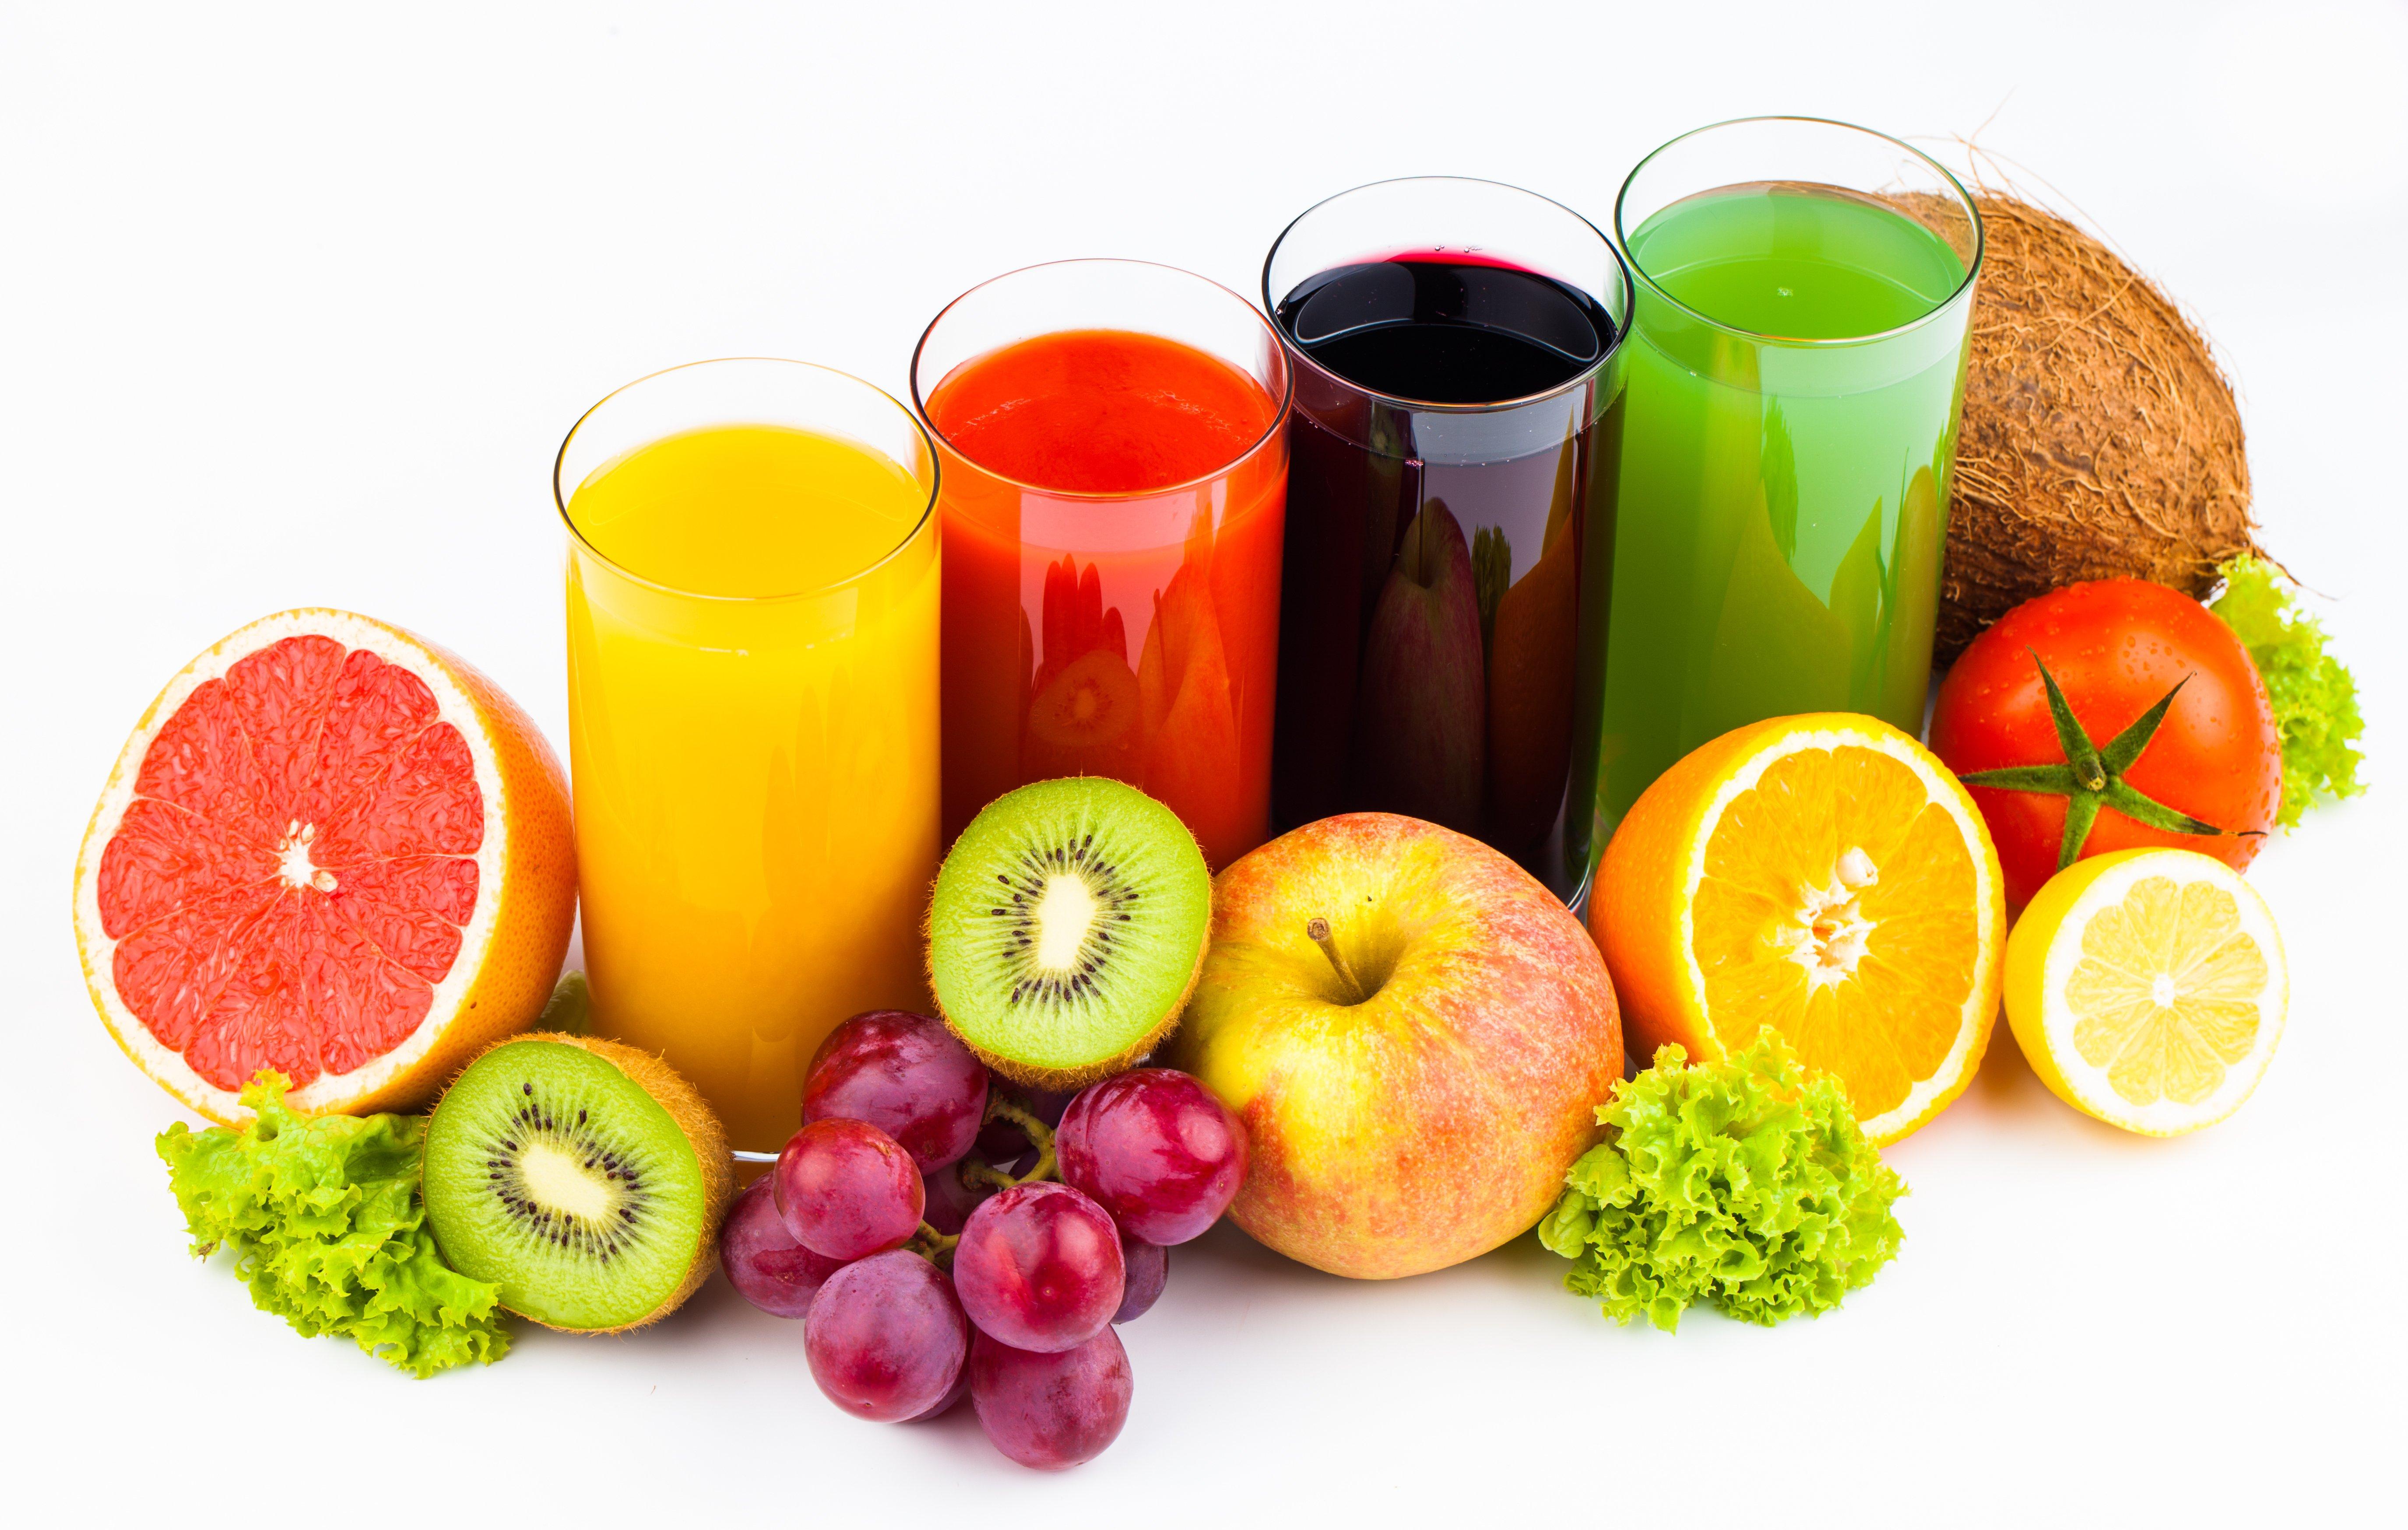 Juice Fruit Orange fruit Kiwi Apples Grapes Highball glass wallpaper 5501x3495